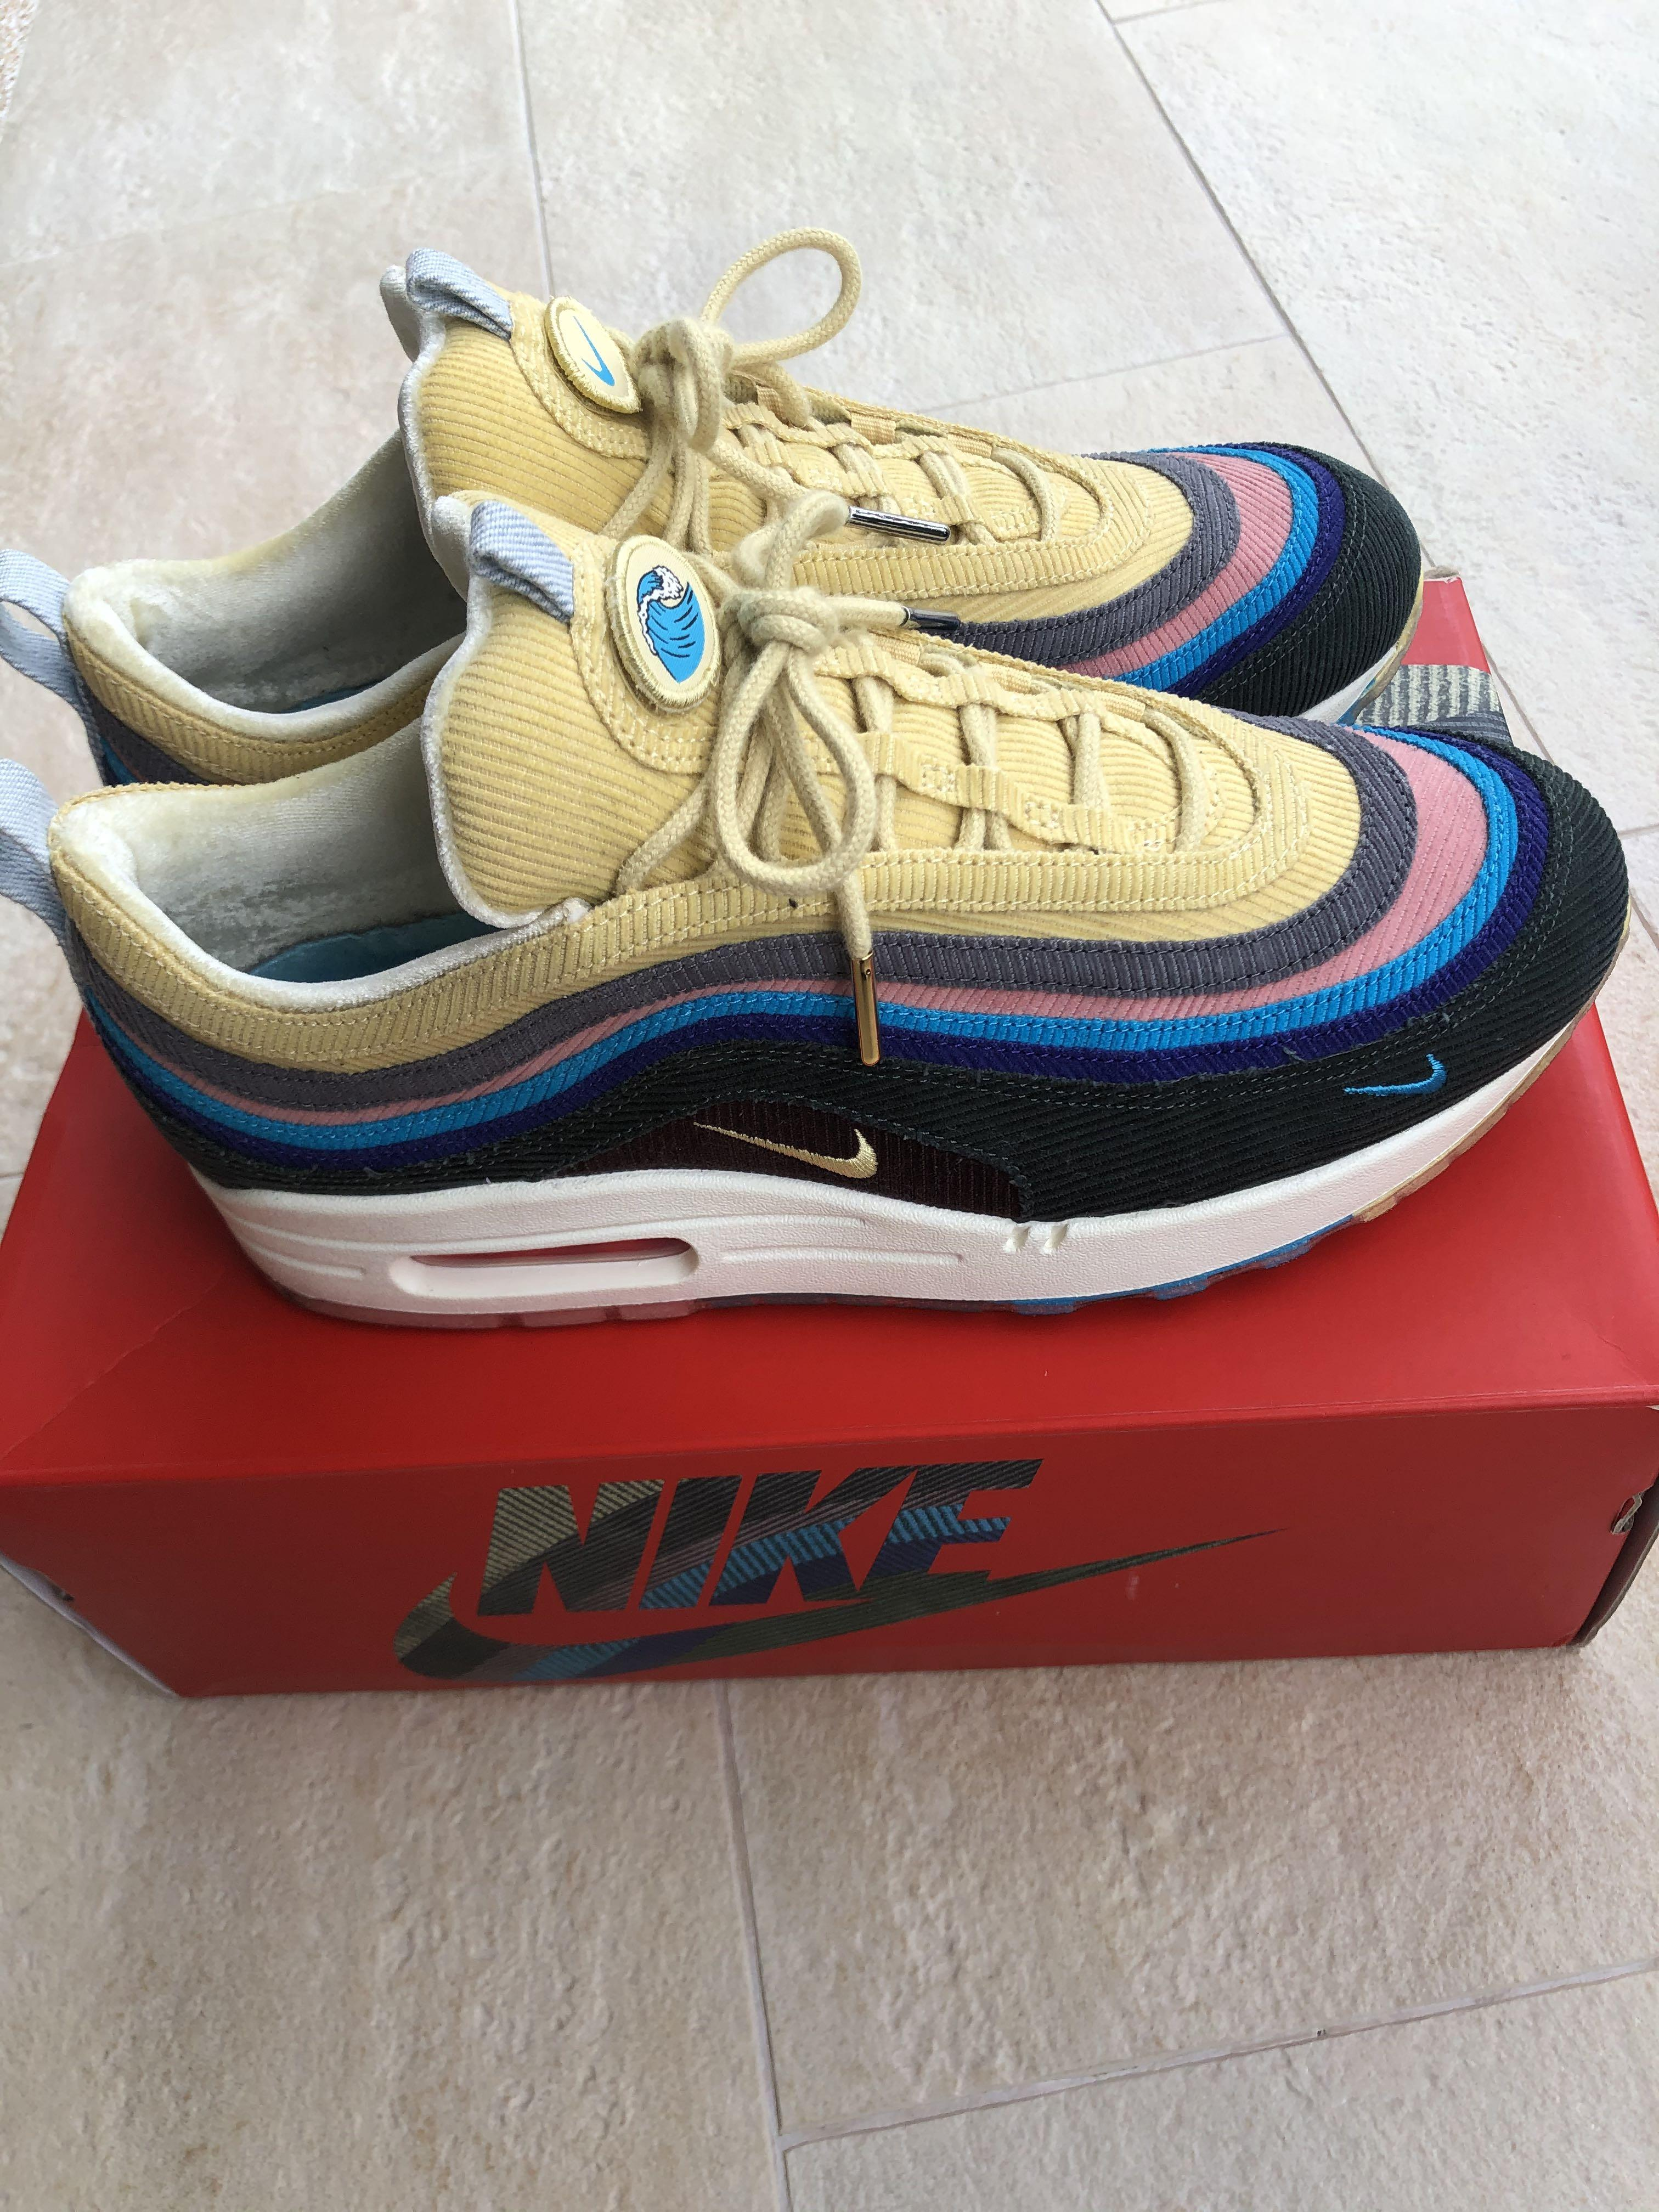 Nike Sean Wotherspoon Air Max 97/1, Men